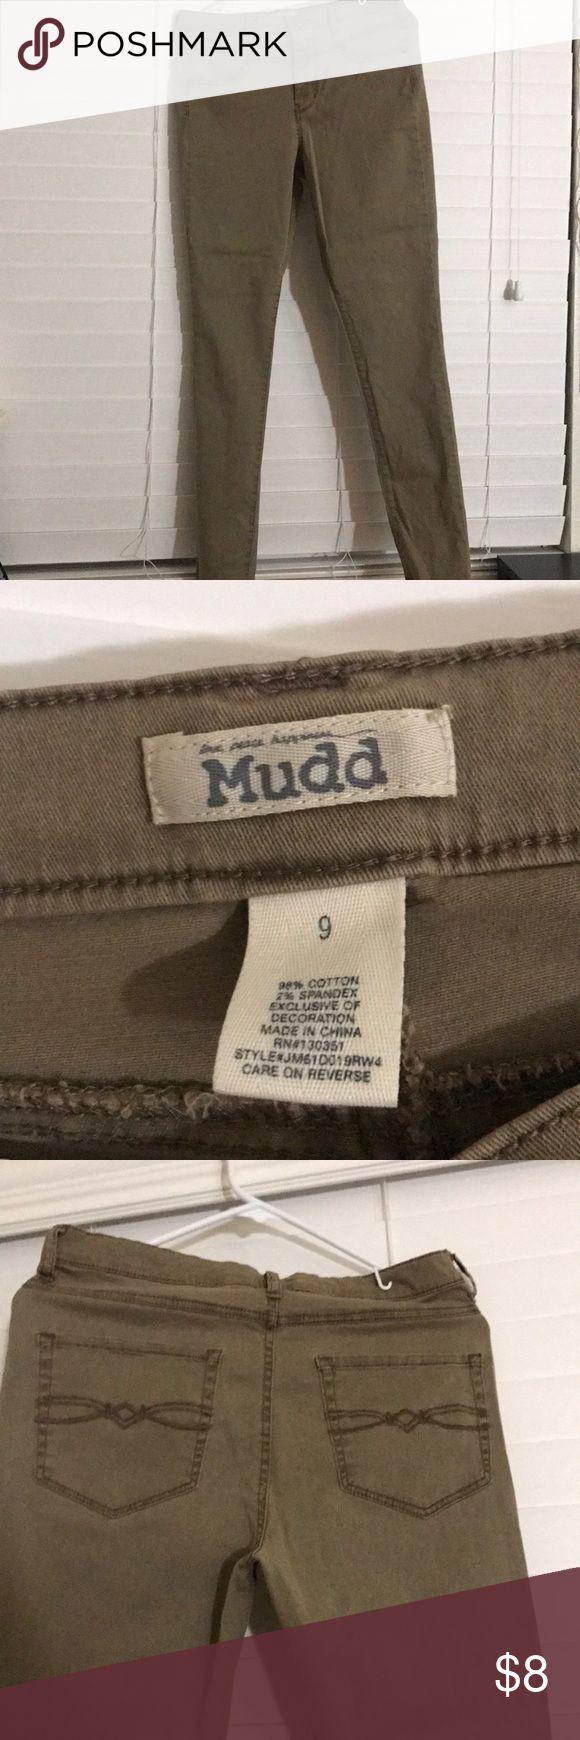 Pants mudd brand Mudd brand, juniors for teen size 9soft cotton with  spandex khaki jeans straight leg. Mudd Bottoms Jeans